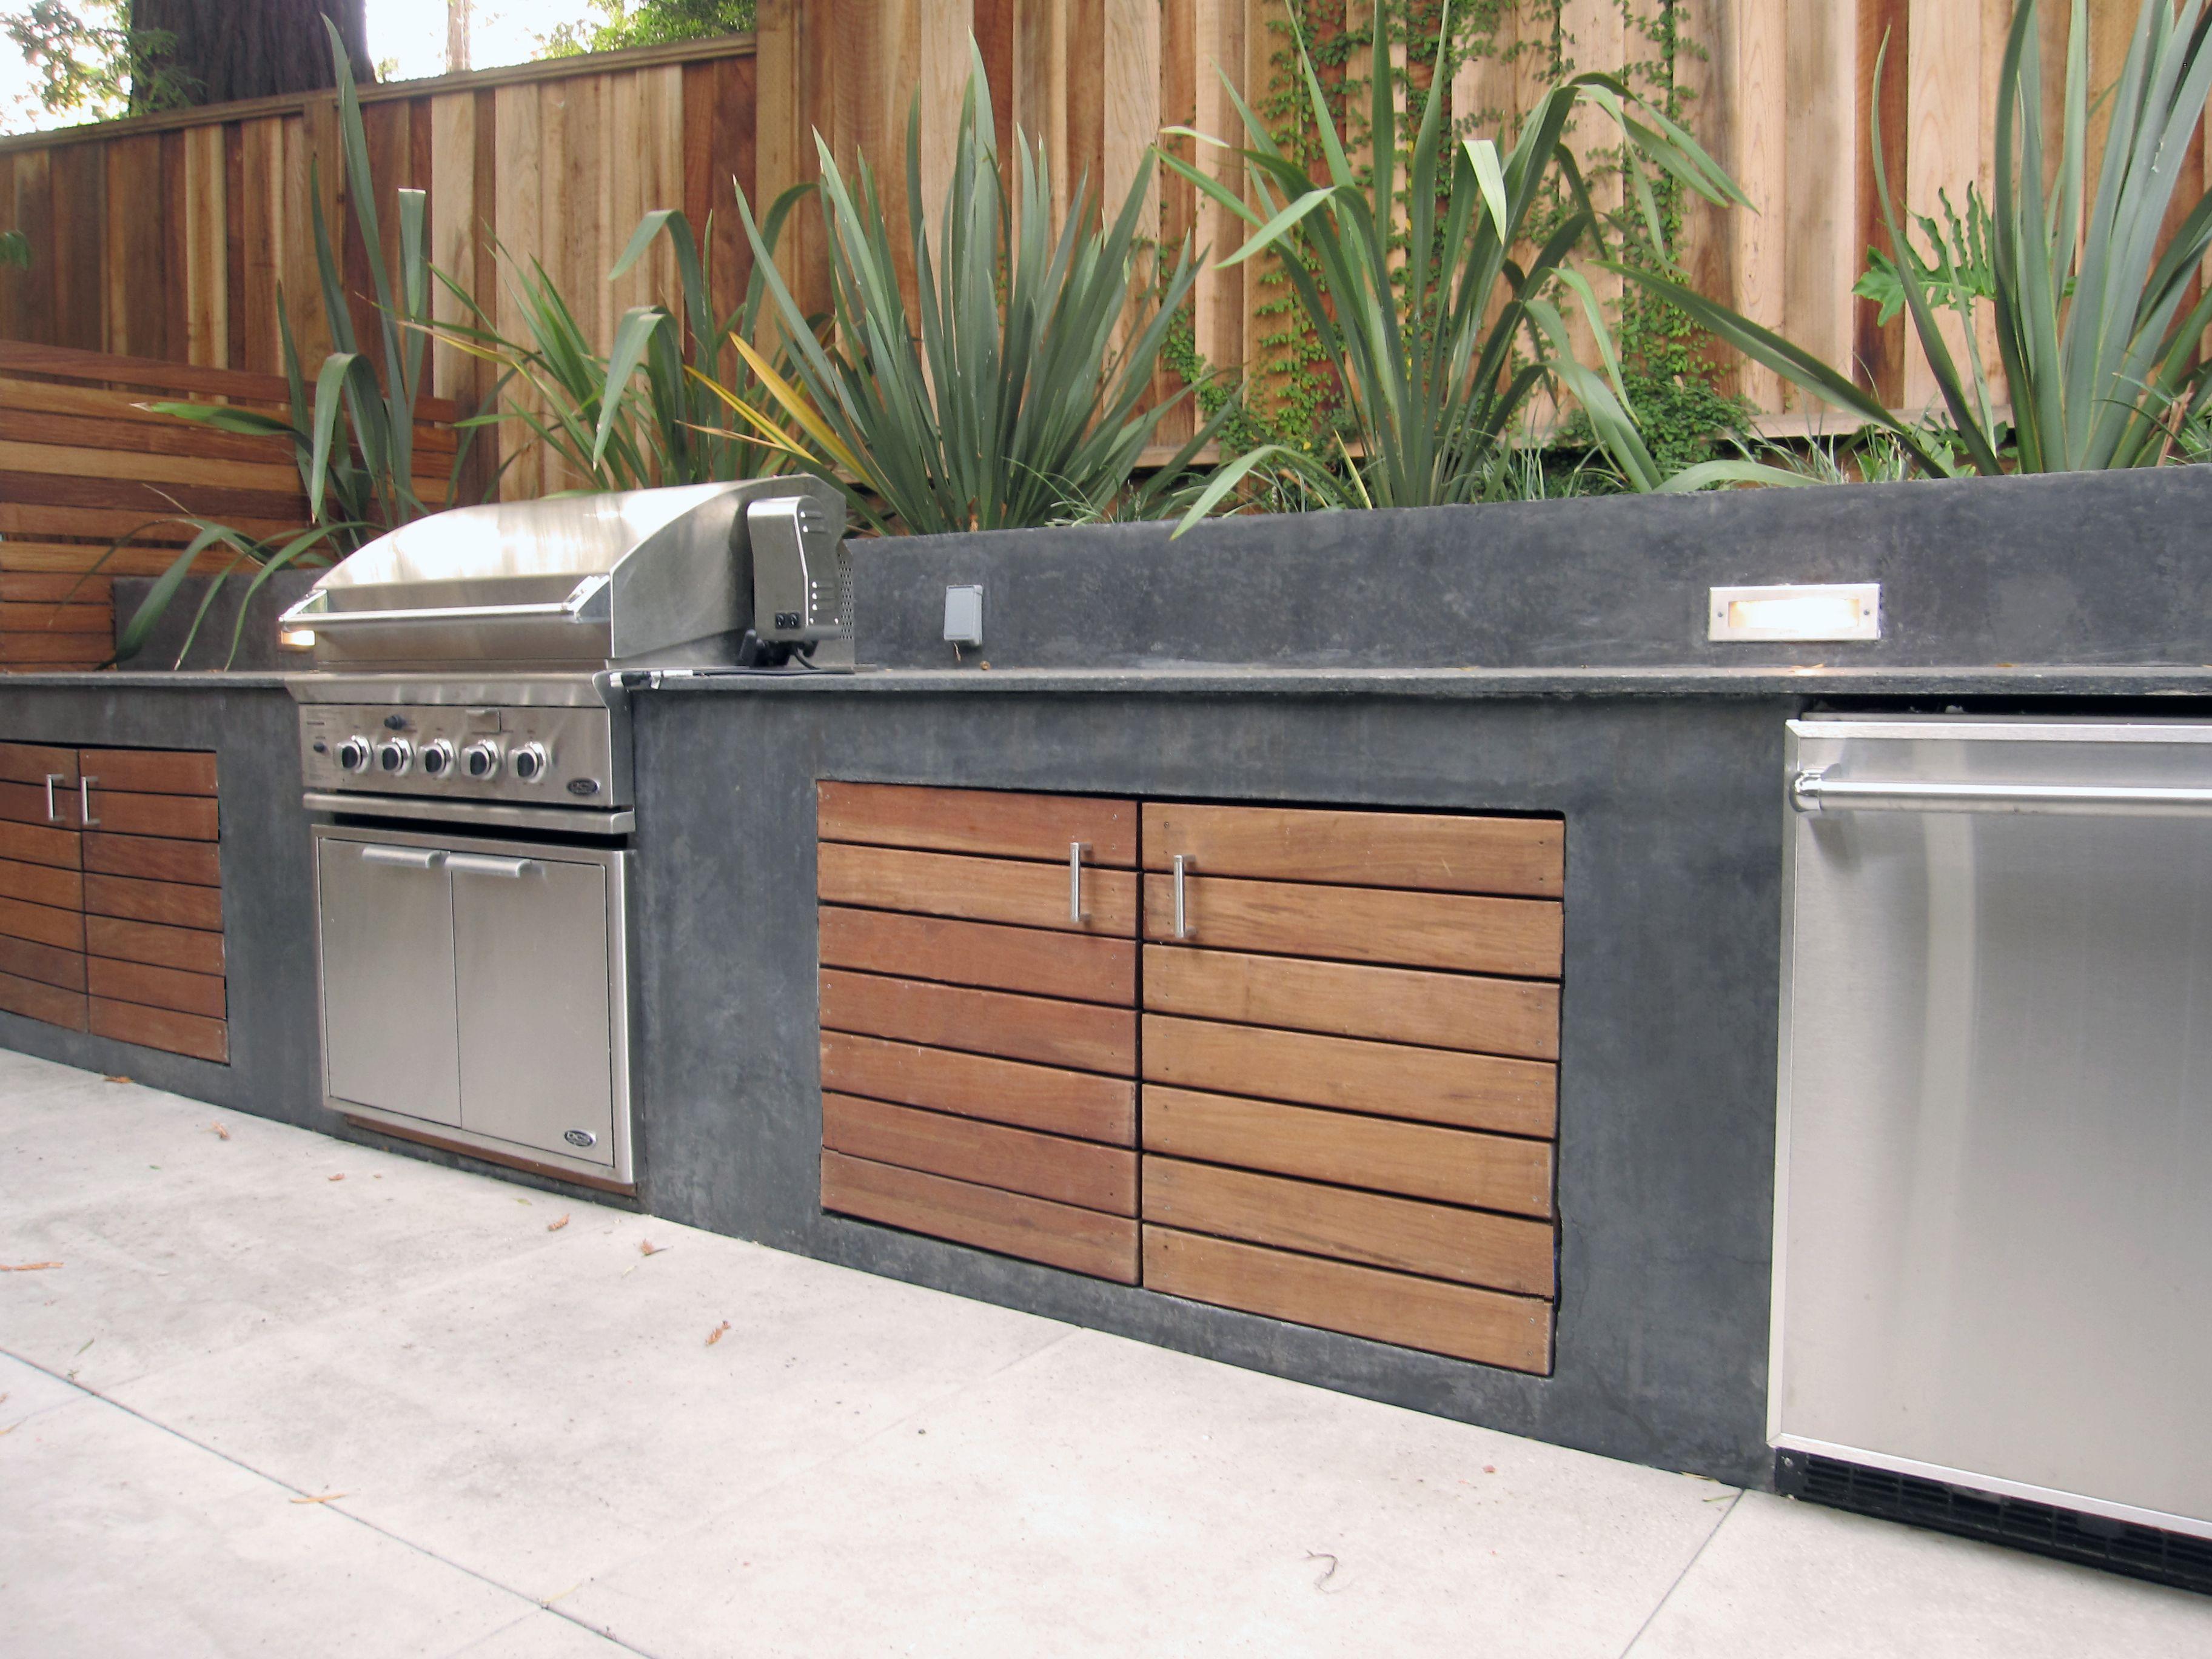 Shades Of Green Landscape Architecture Home Modern Outdoor Kitchen Outdoor Kitchen Countertops Outdoor Kitchen